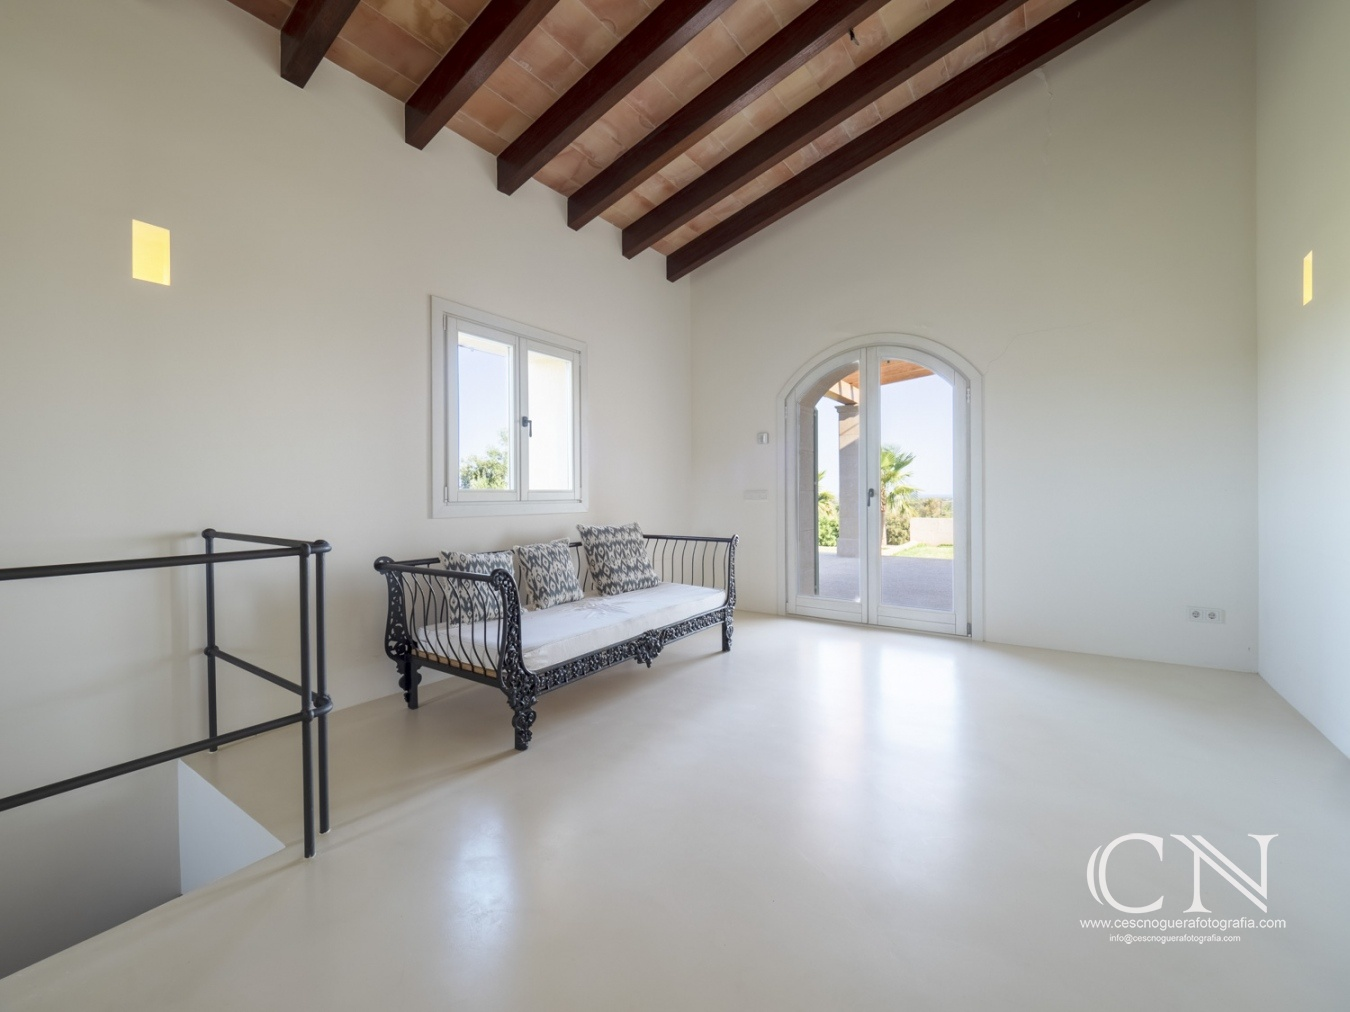 Finca a Santanyi - Cesc Noguera Fotografie, Wenn Fotografie ist eine Leidenschaft, Architectural & Interior design photographer / Landscape Photography